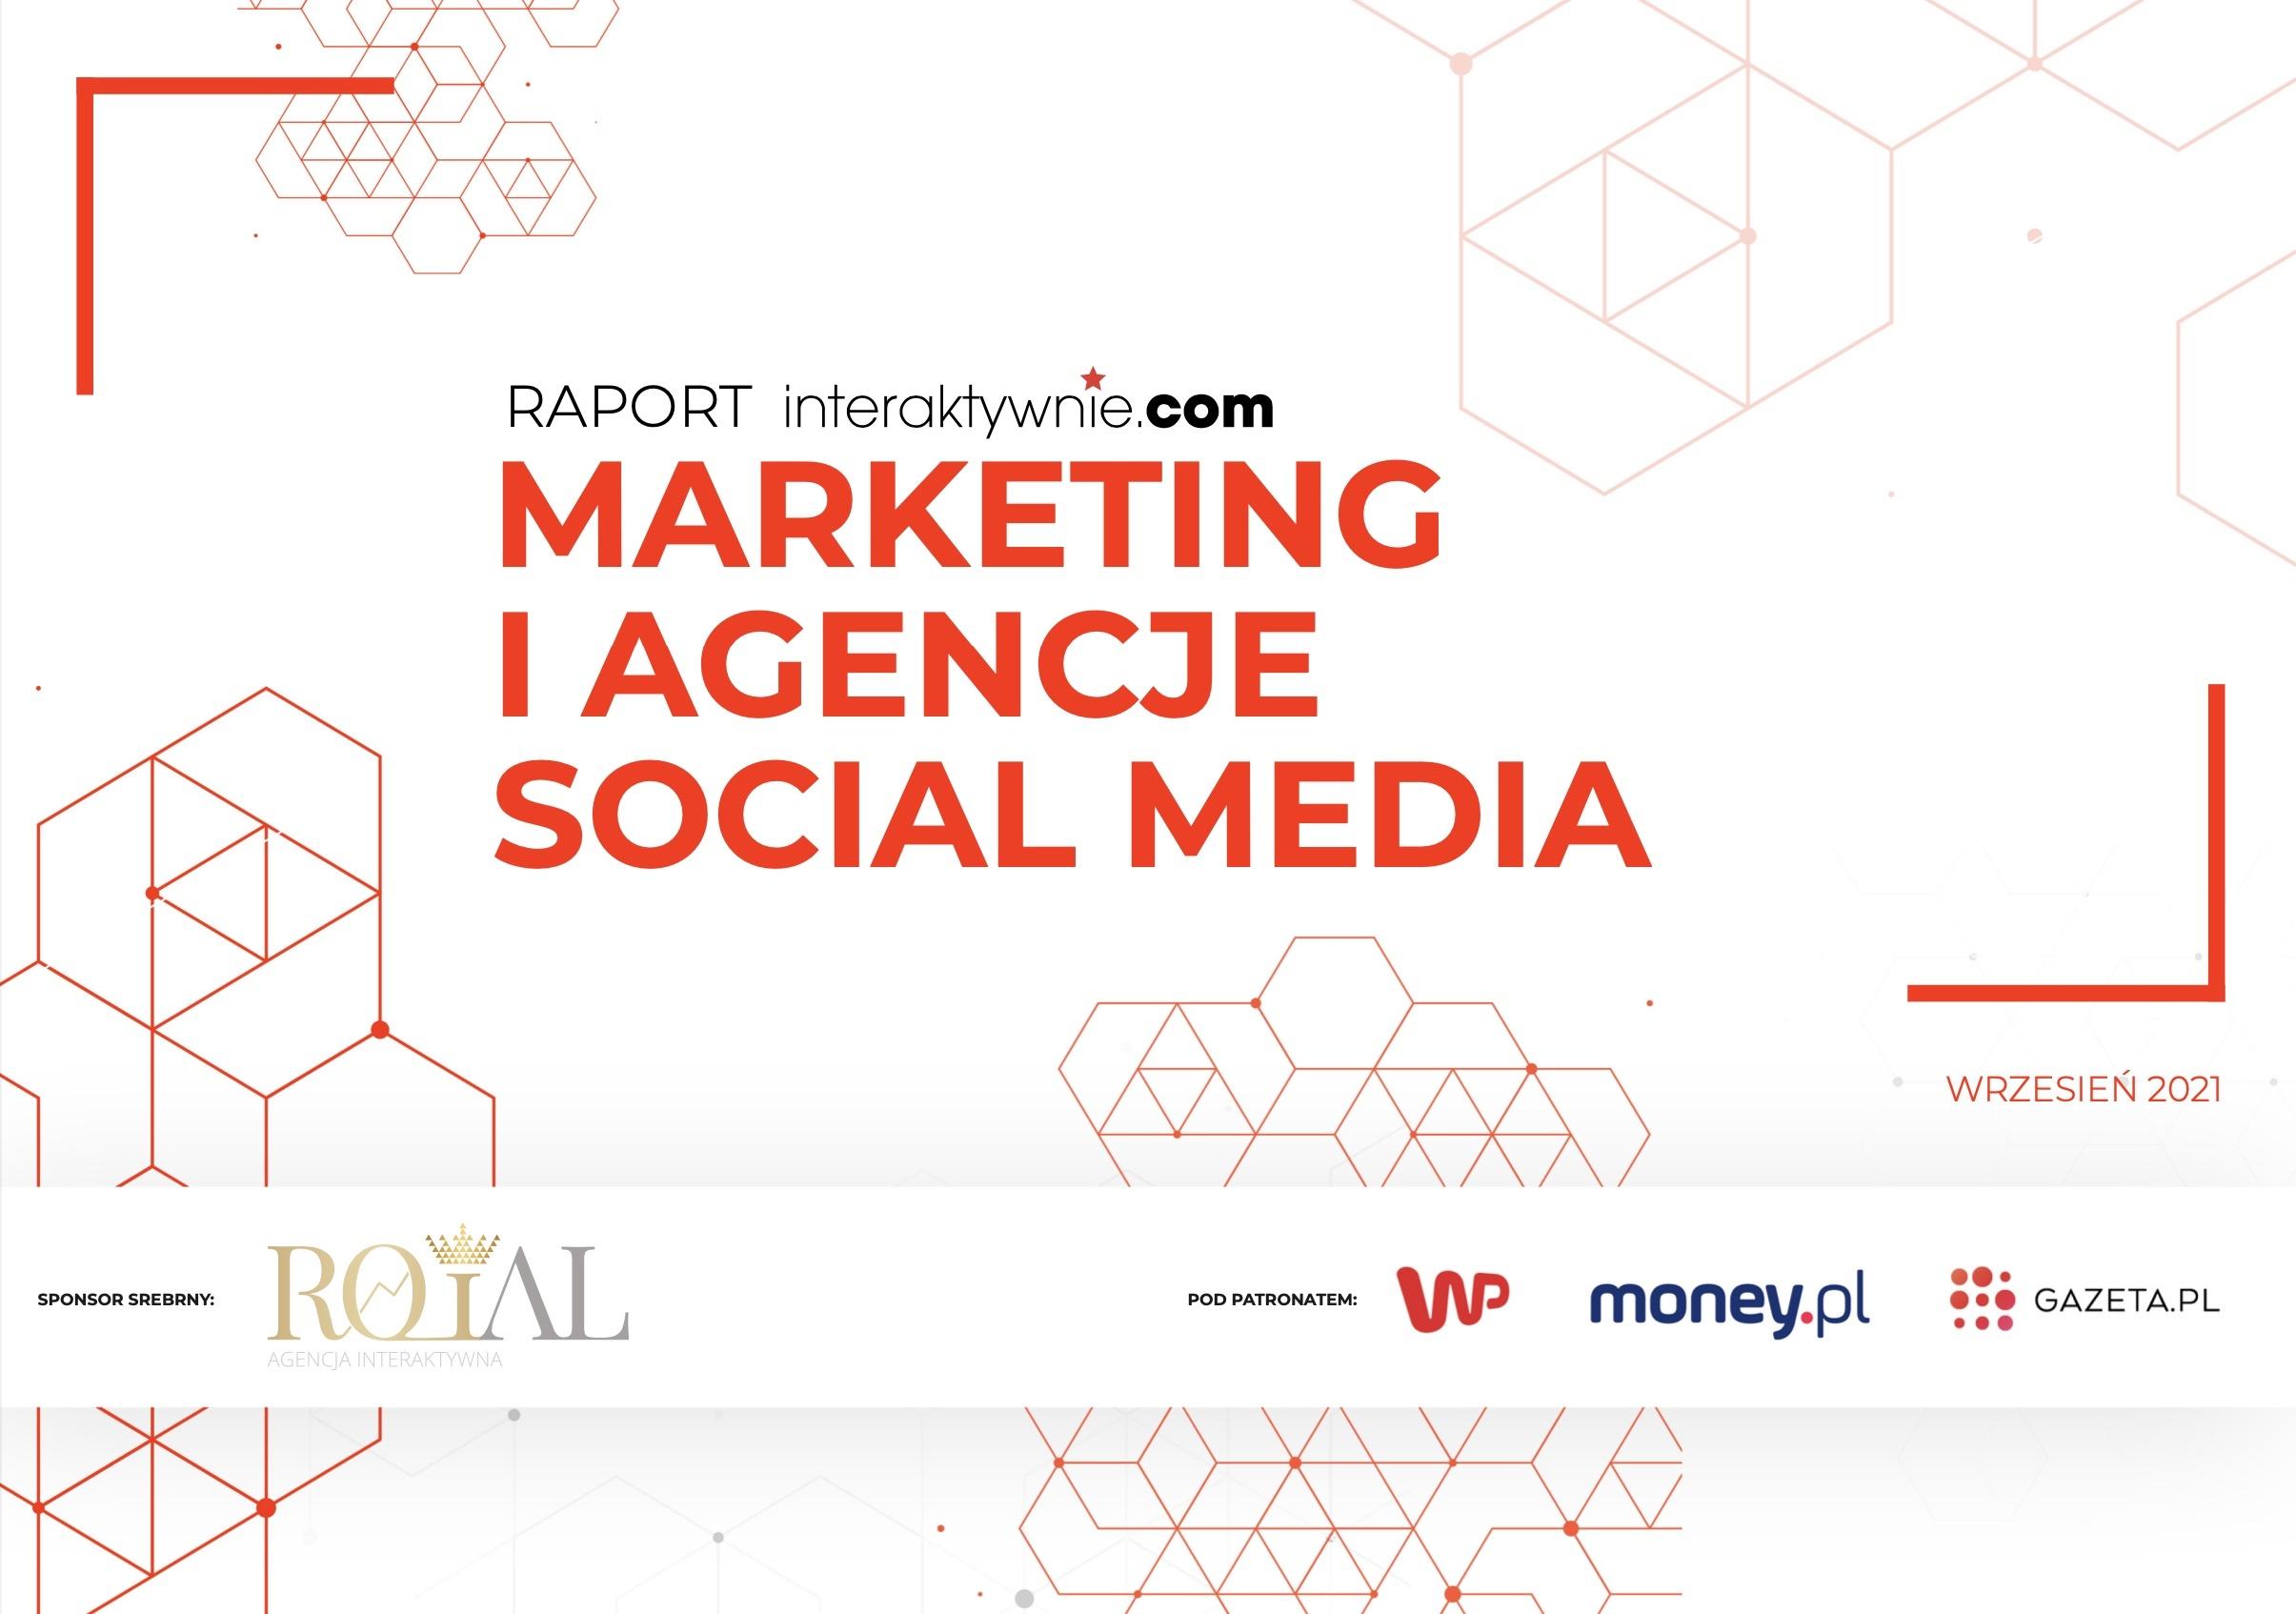 Ranking agencji social media 2021